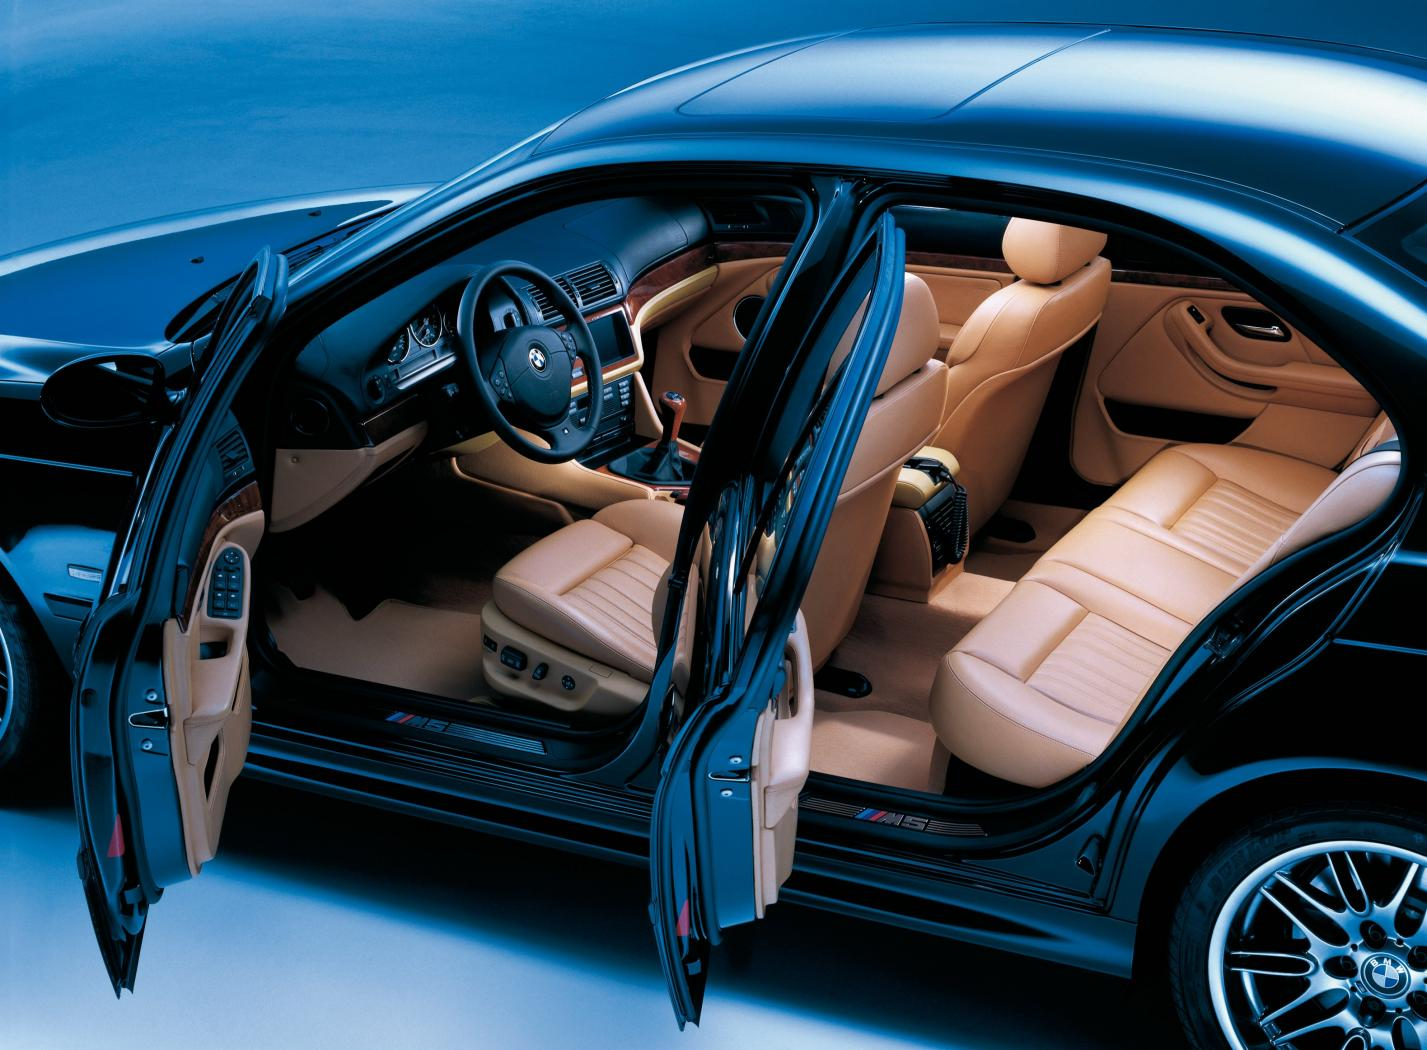 BMW-M5-E39-5_20170925-1615.jpeg